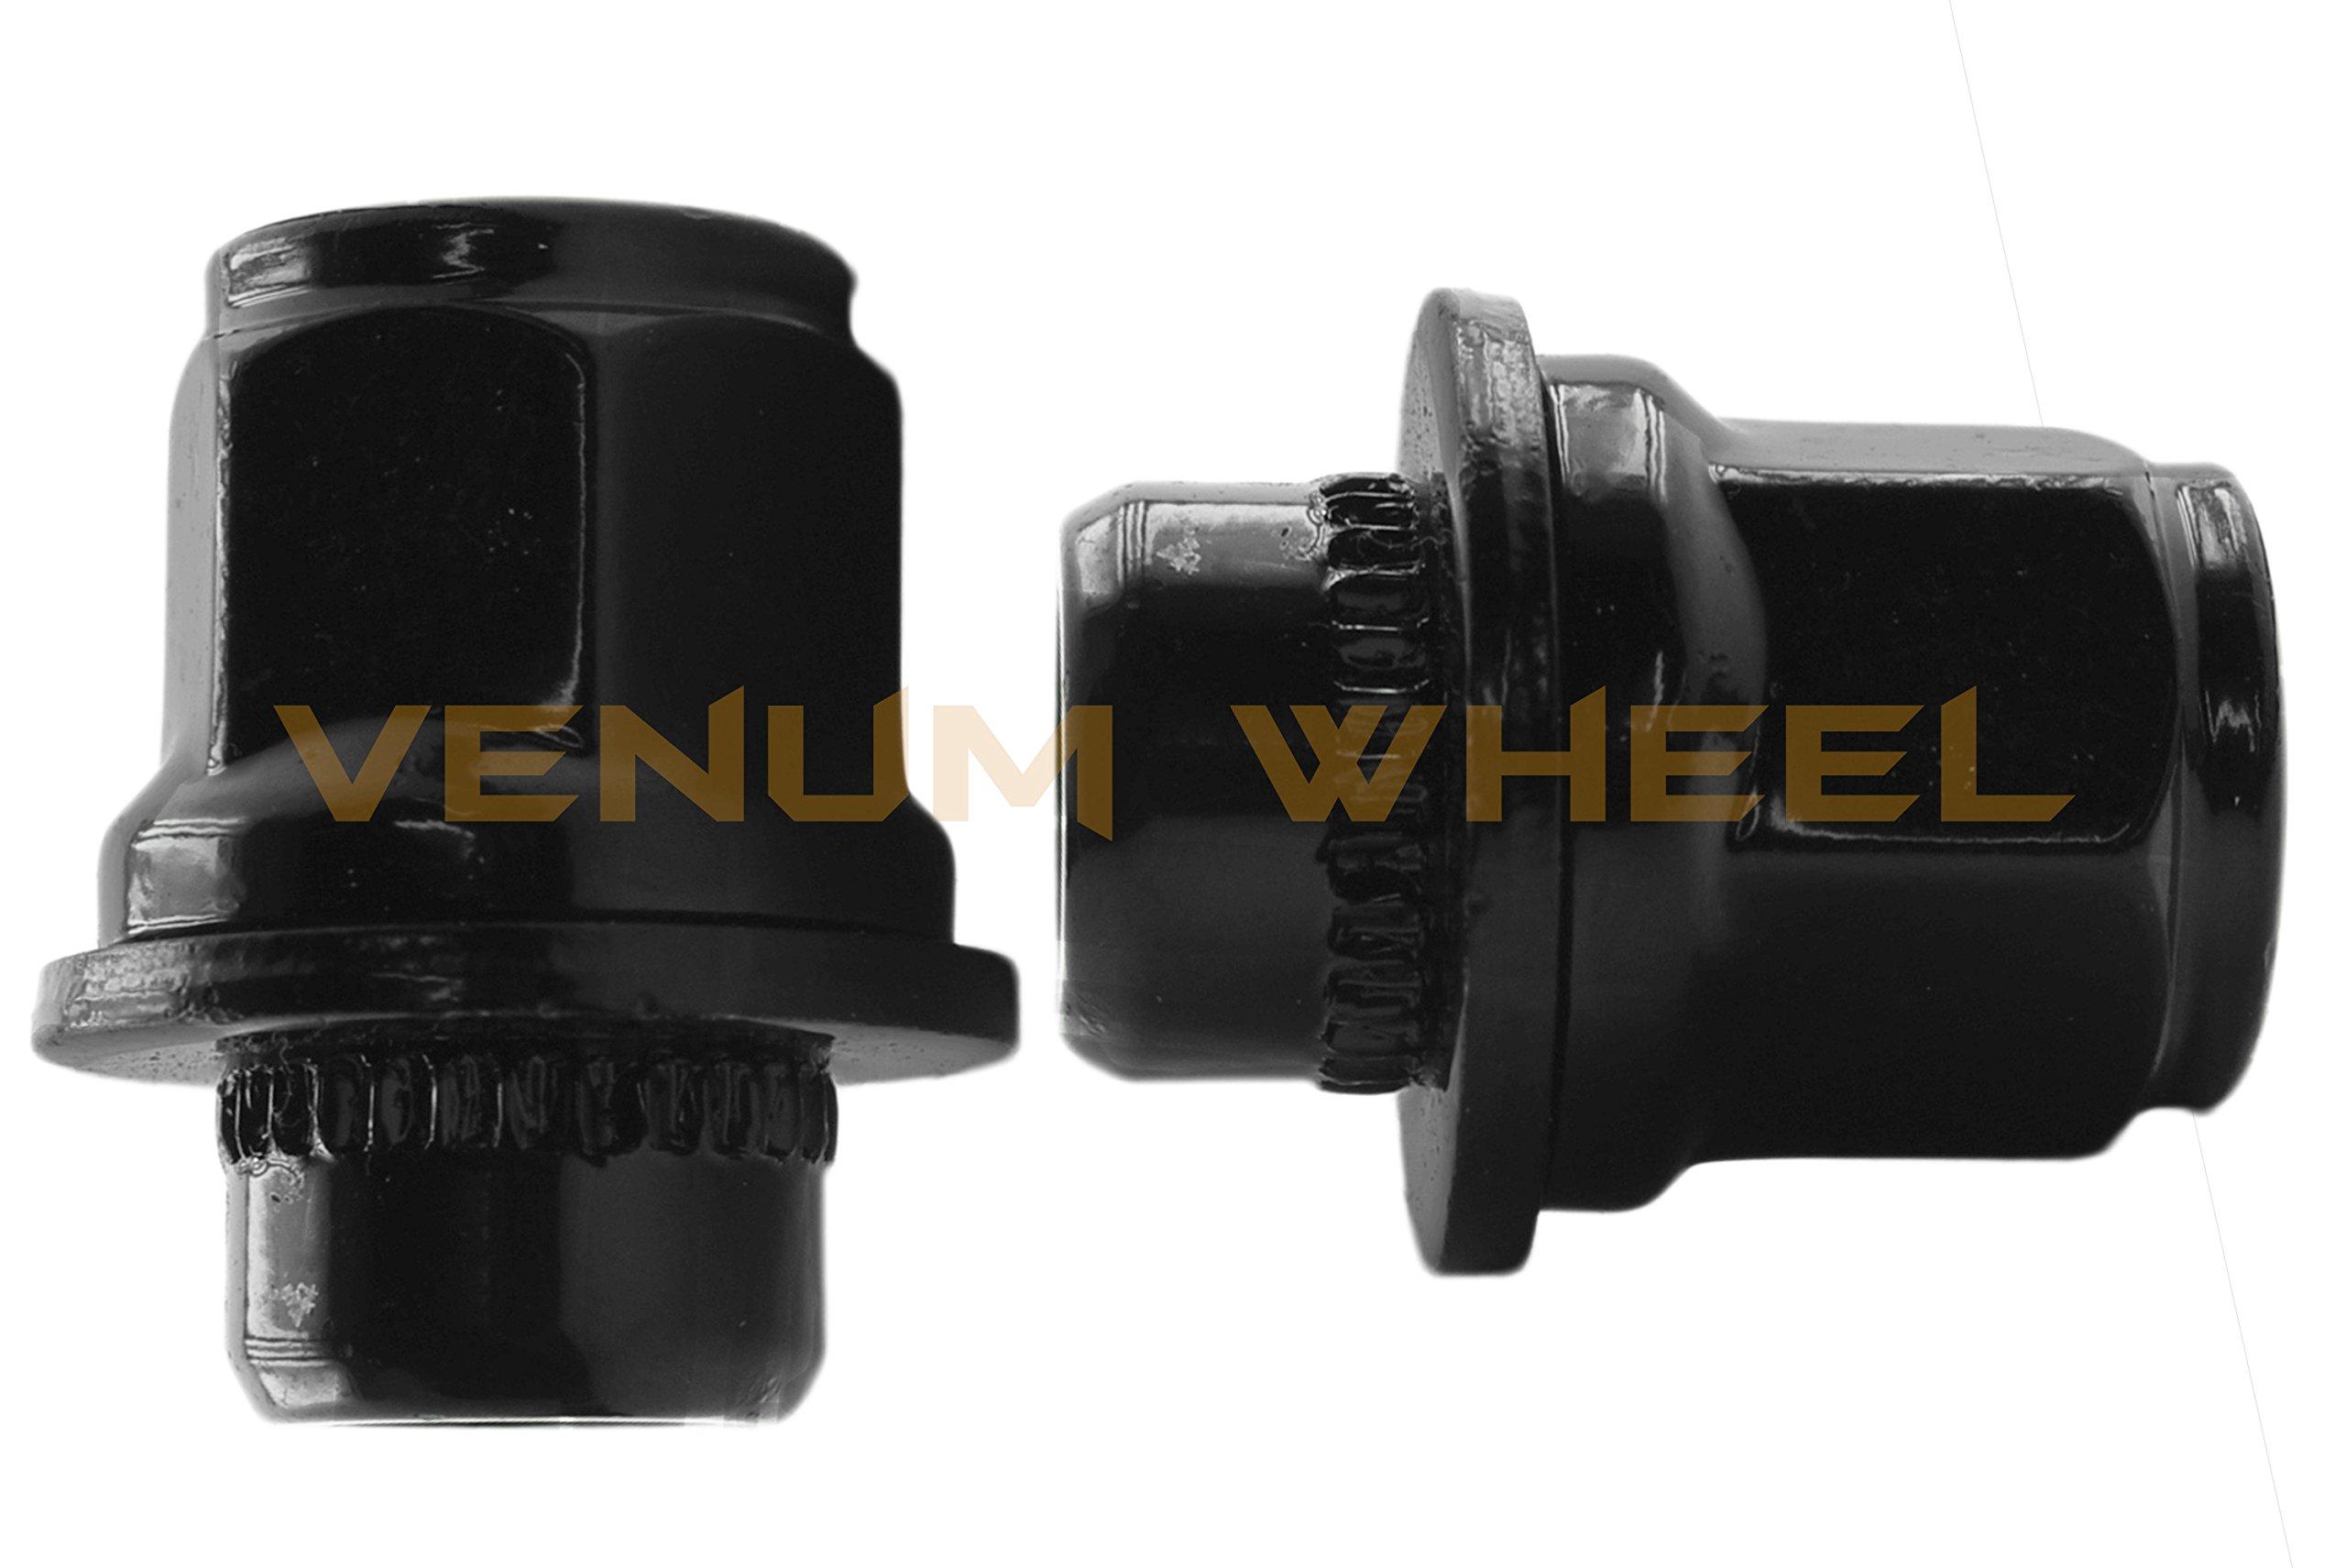 24 Pc Black Toyota Tacoma Tundra Fj Cruiser Oem Mag Seat Lug Nuts 12x1.5 1.45'' Tall 6 Lug by Venum wheel accessories (Image #3)